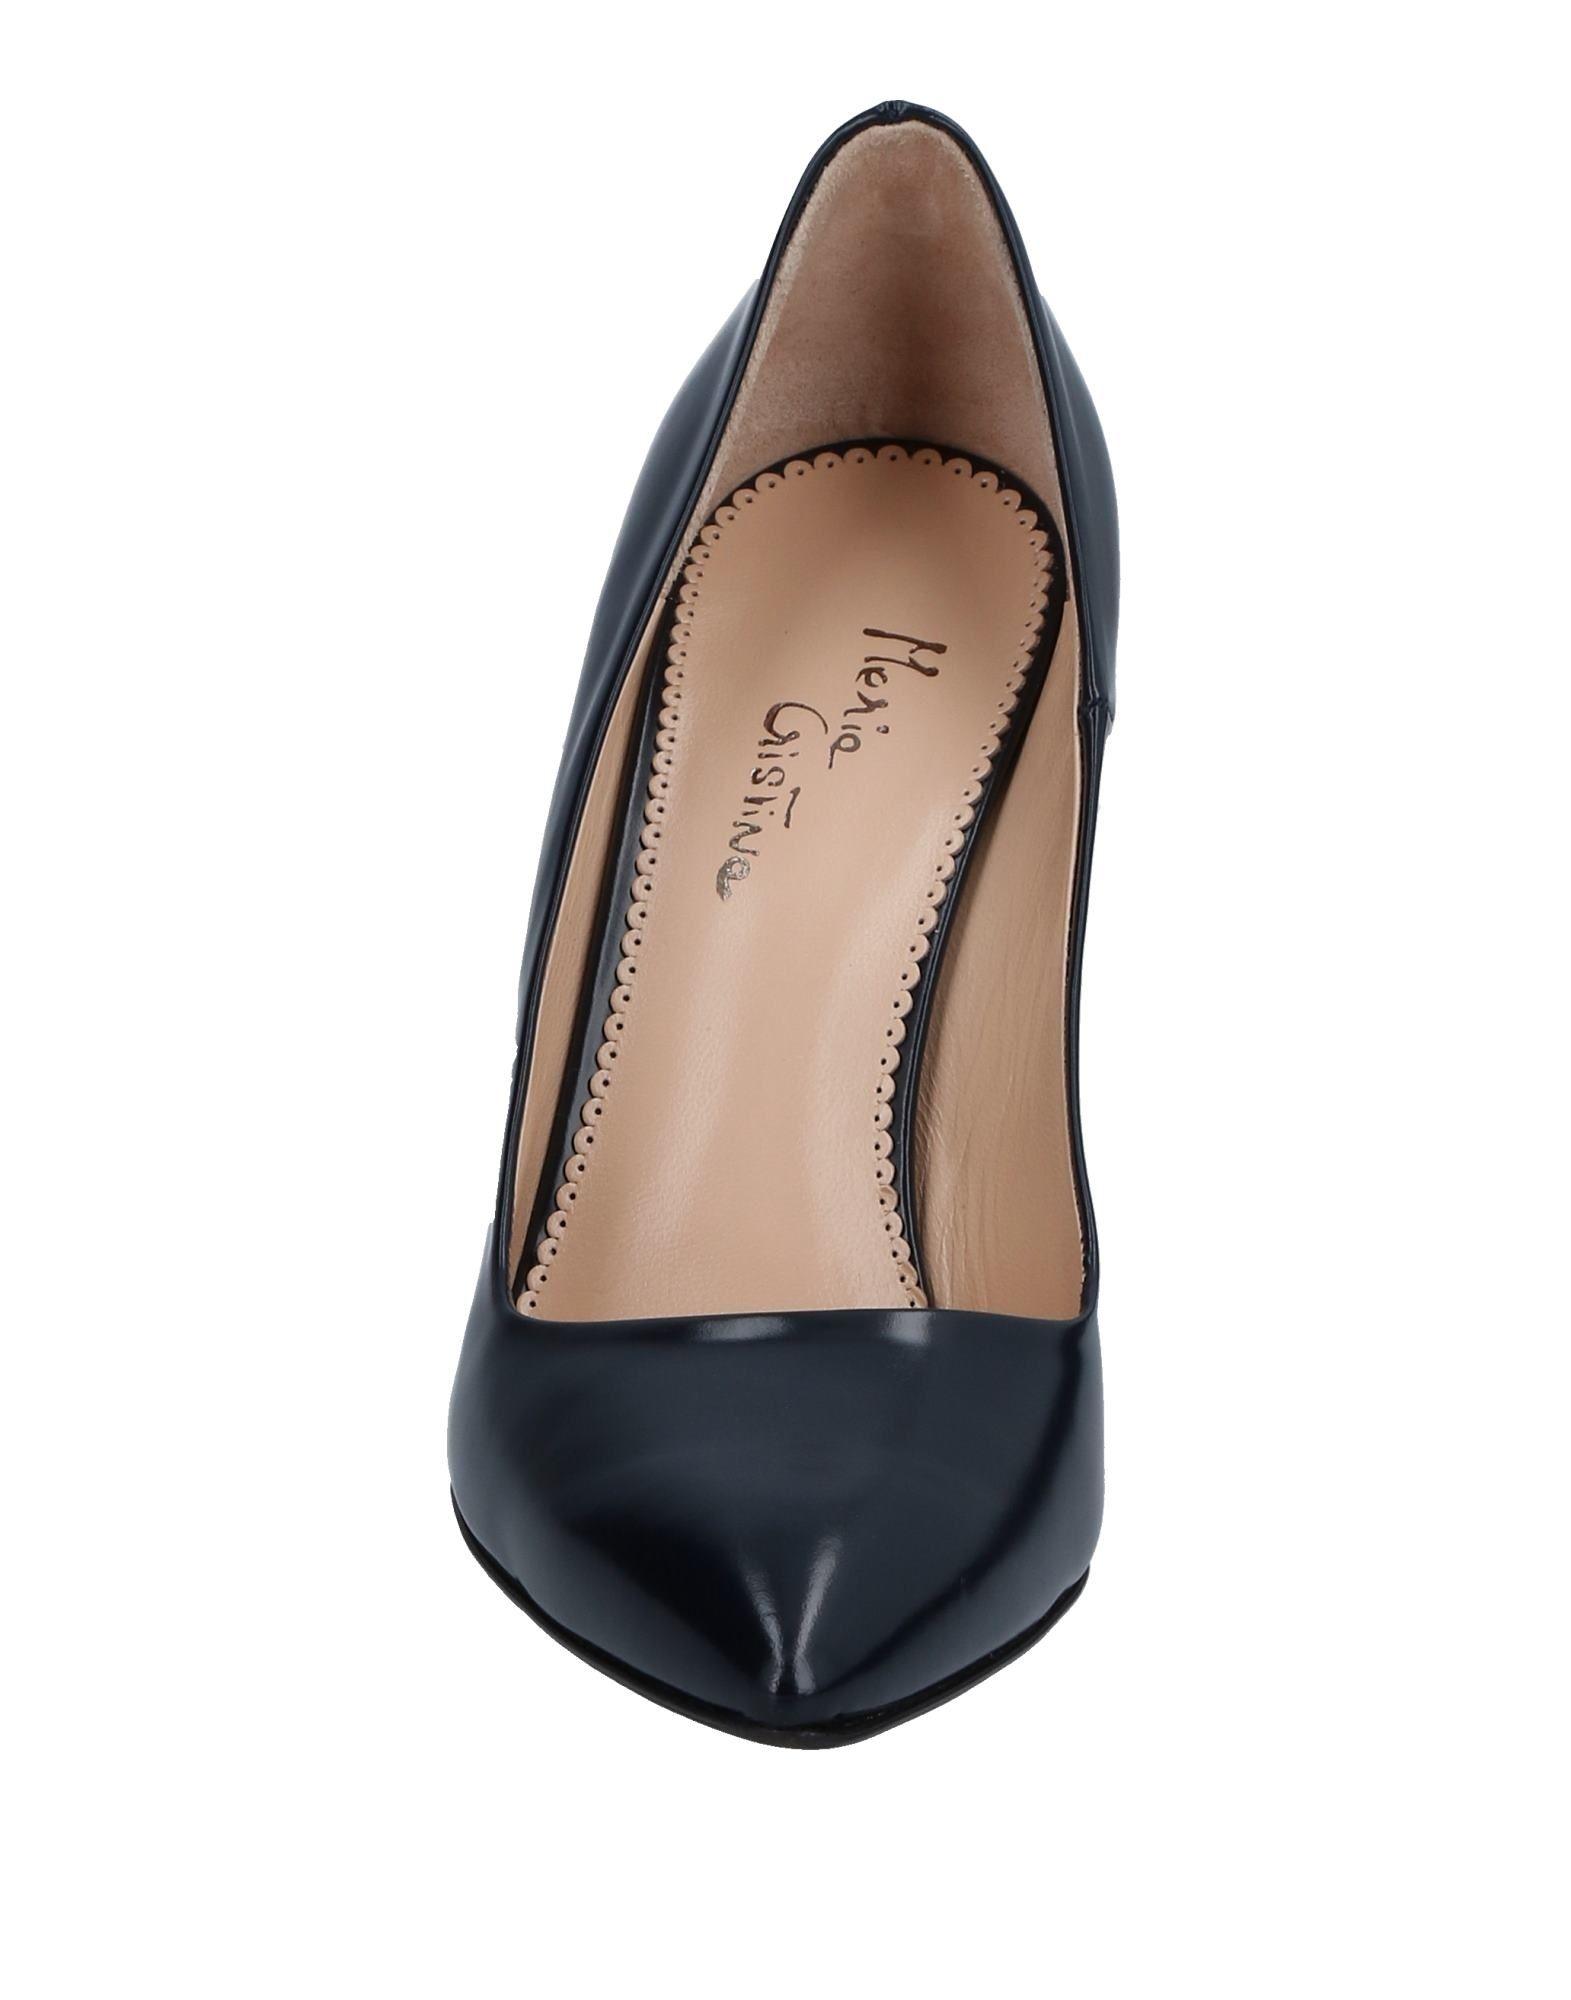 Maria Cristina Pumps Damen  11505519AO Neue Schuhe Schuhe Schuhe 7c6e30